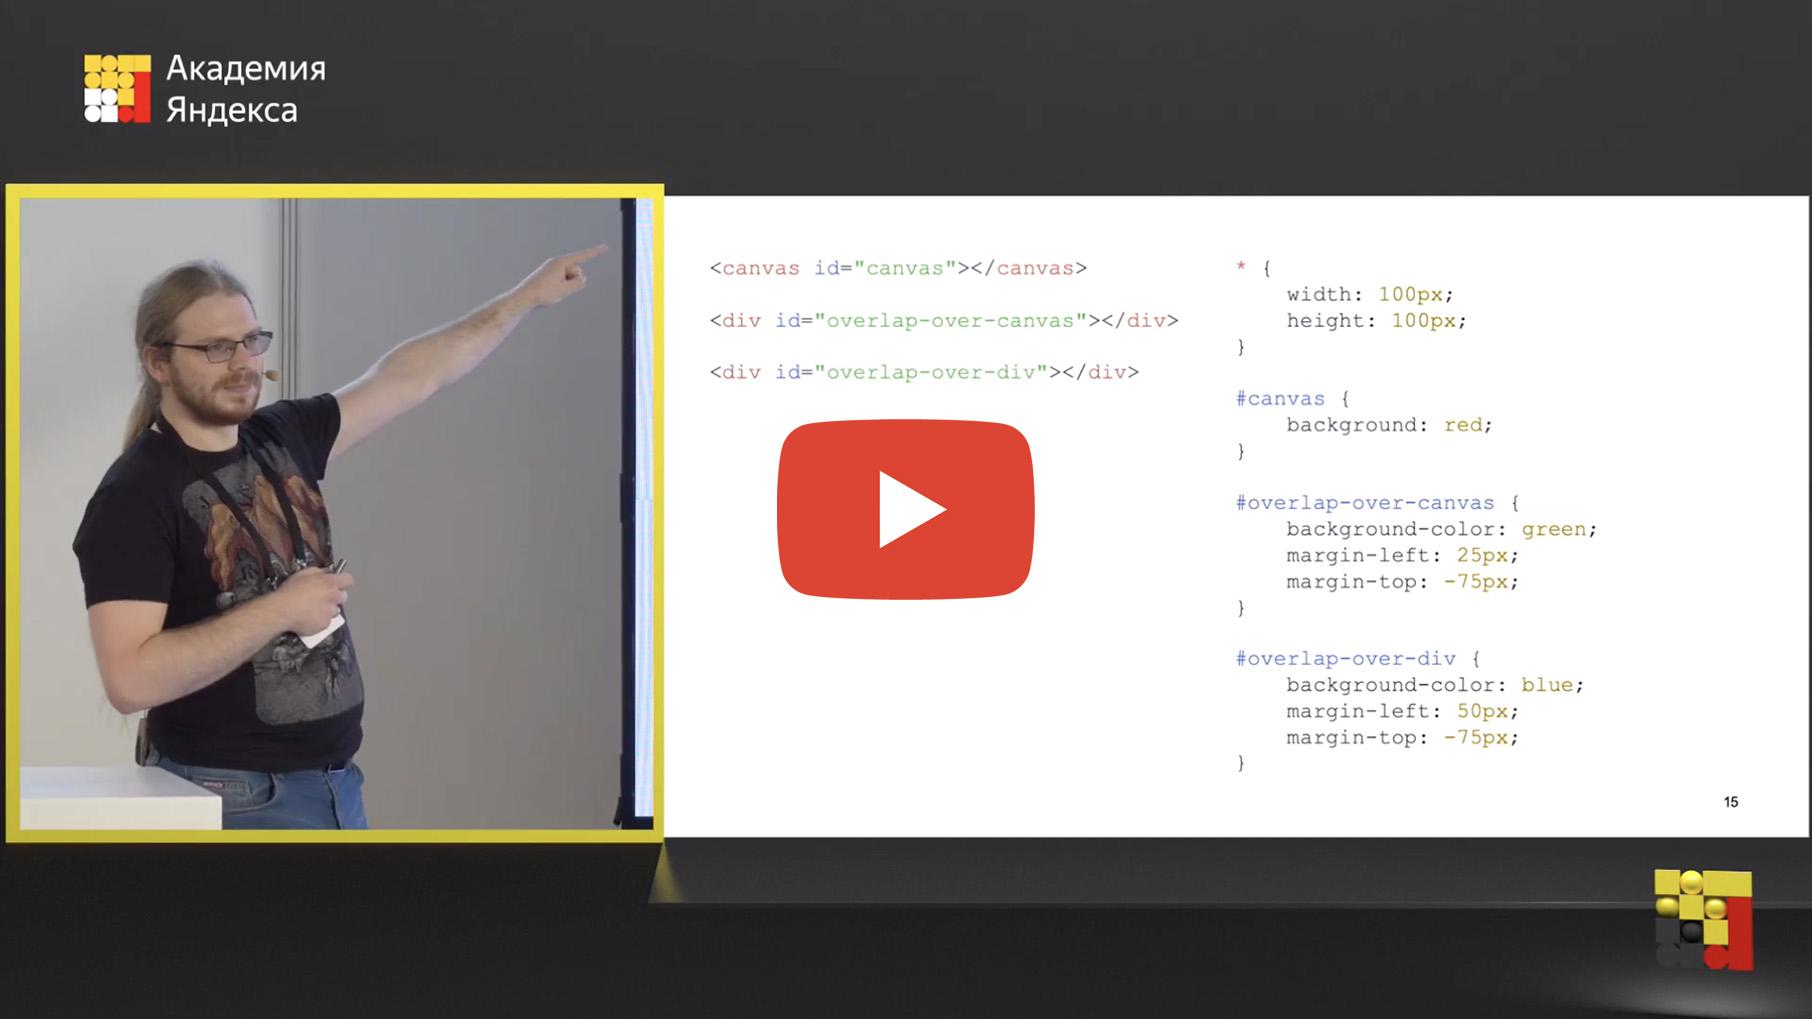 Как рисует браузер. Доклад Яндекса - 1